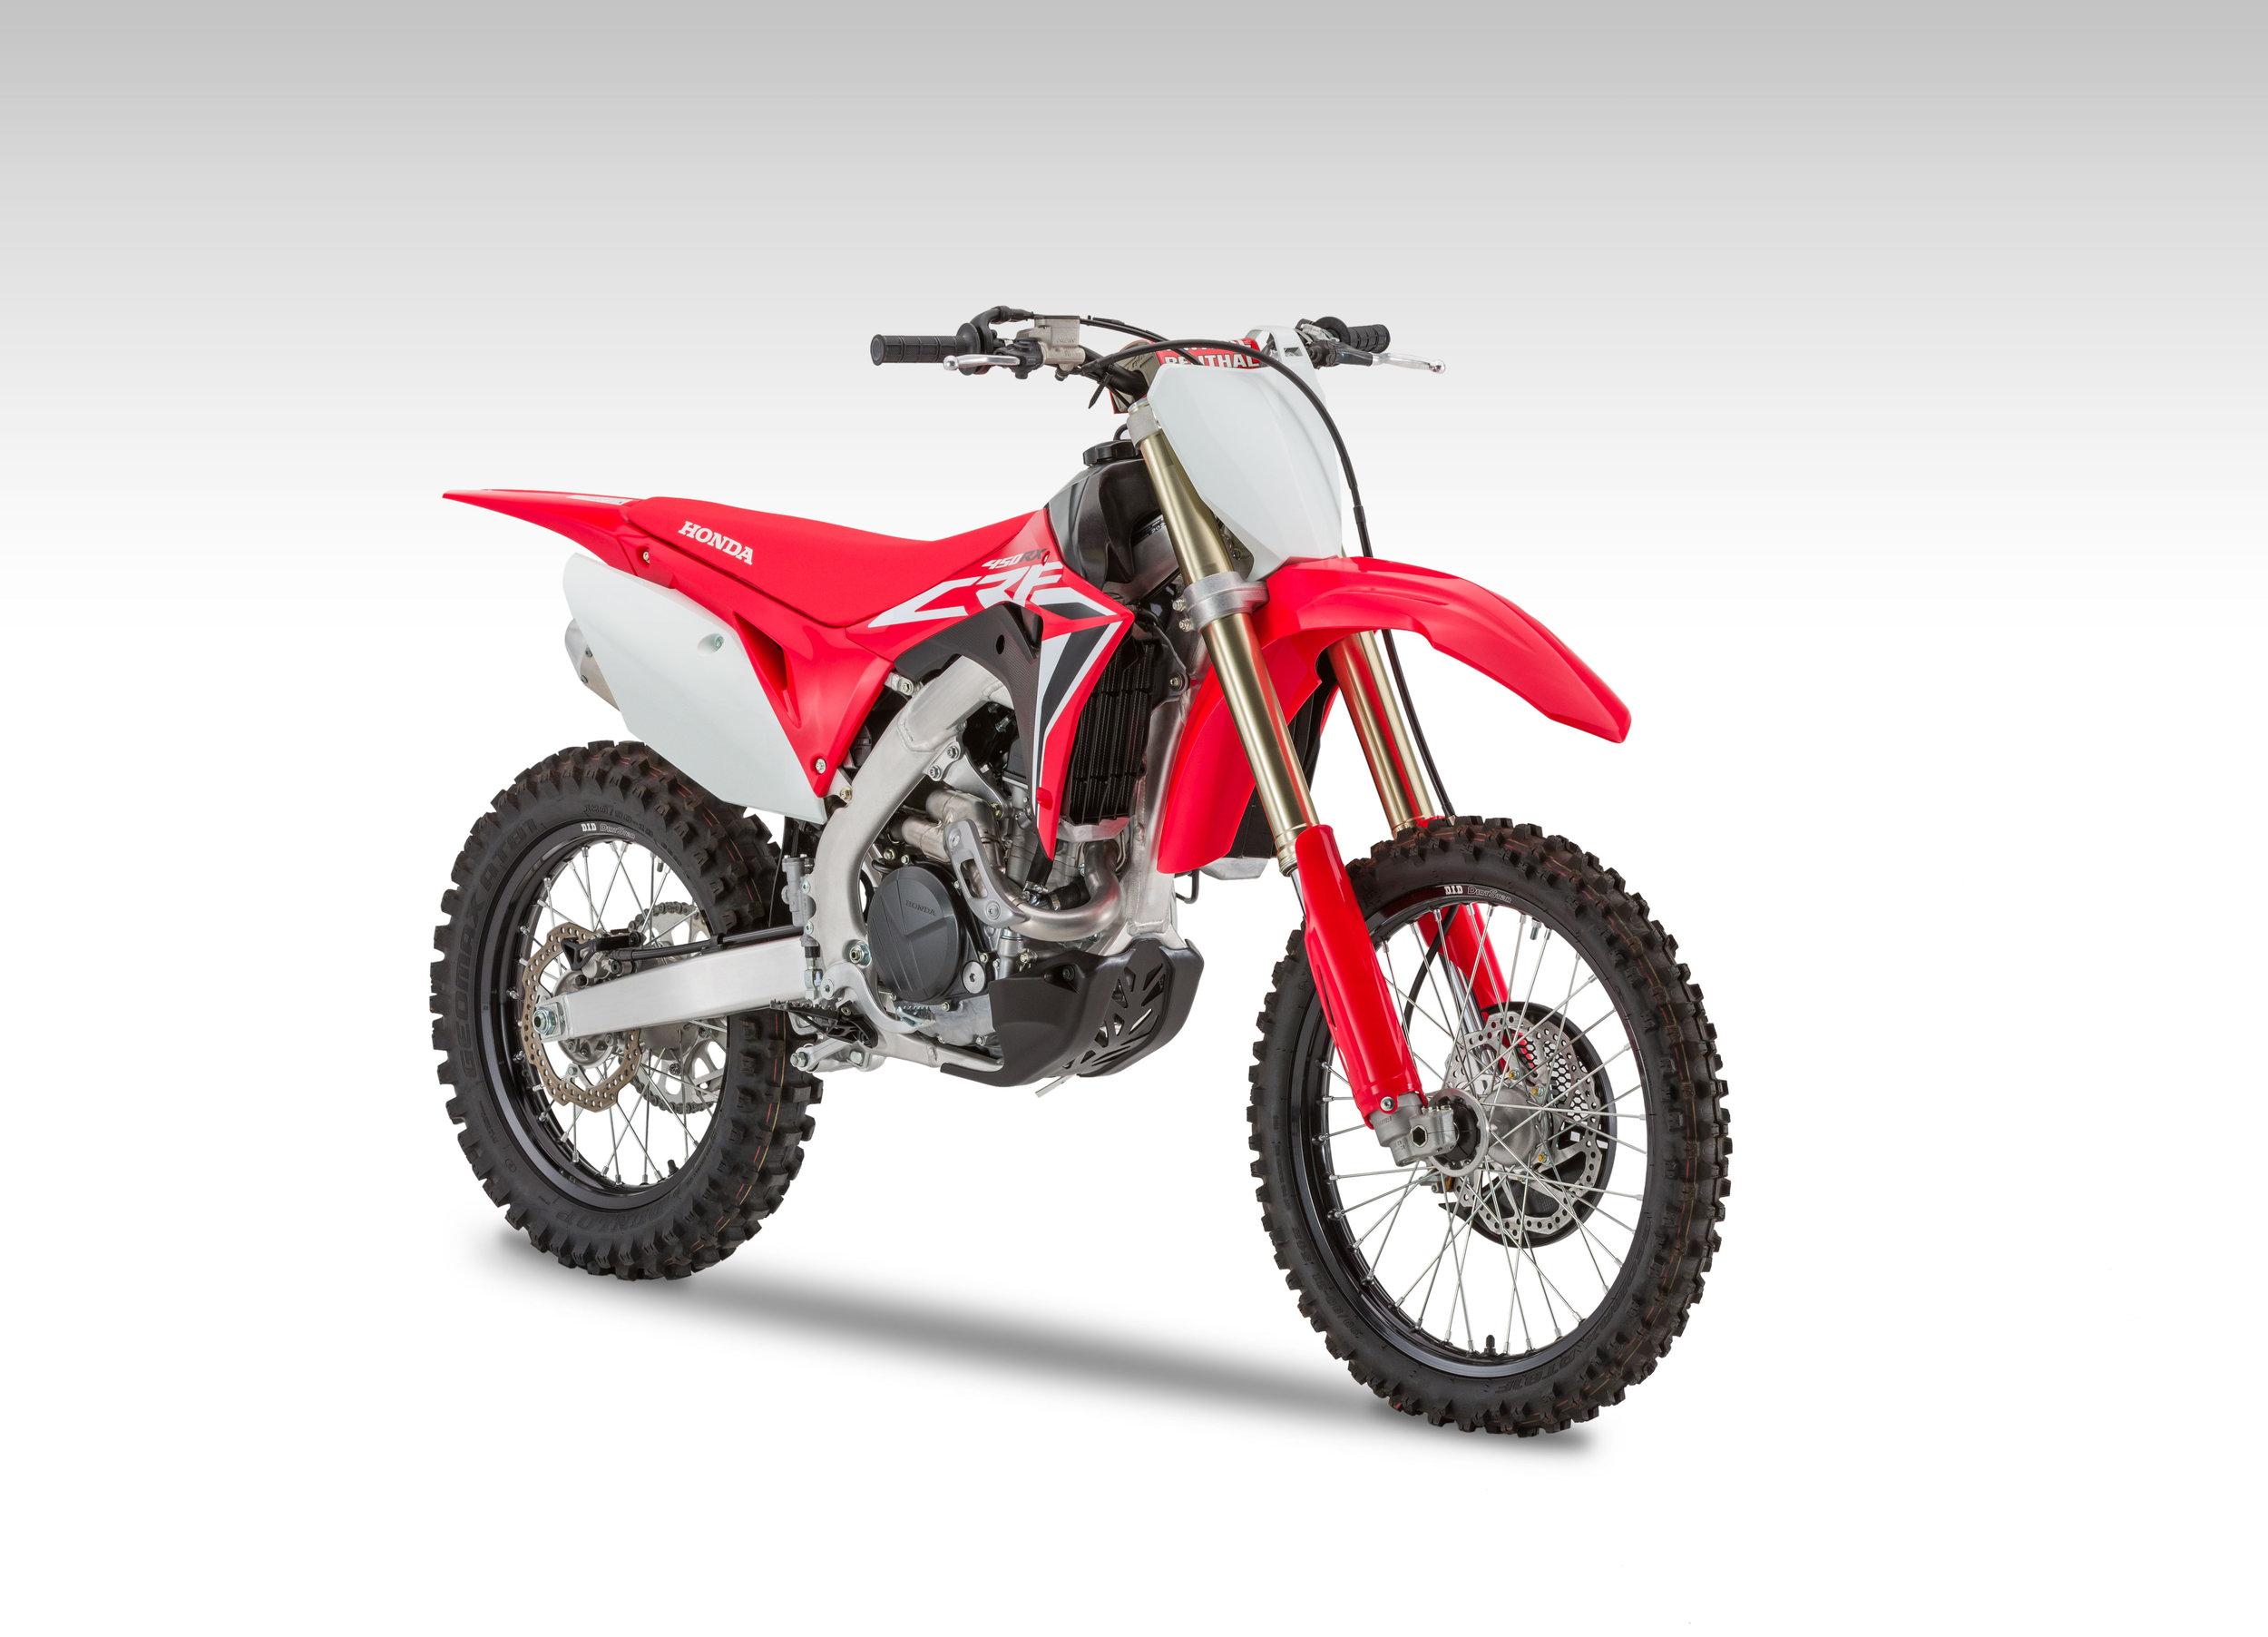 20_Honda_CRF450RX_34R.jpg